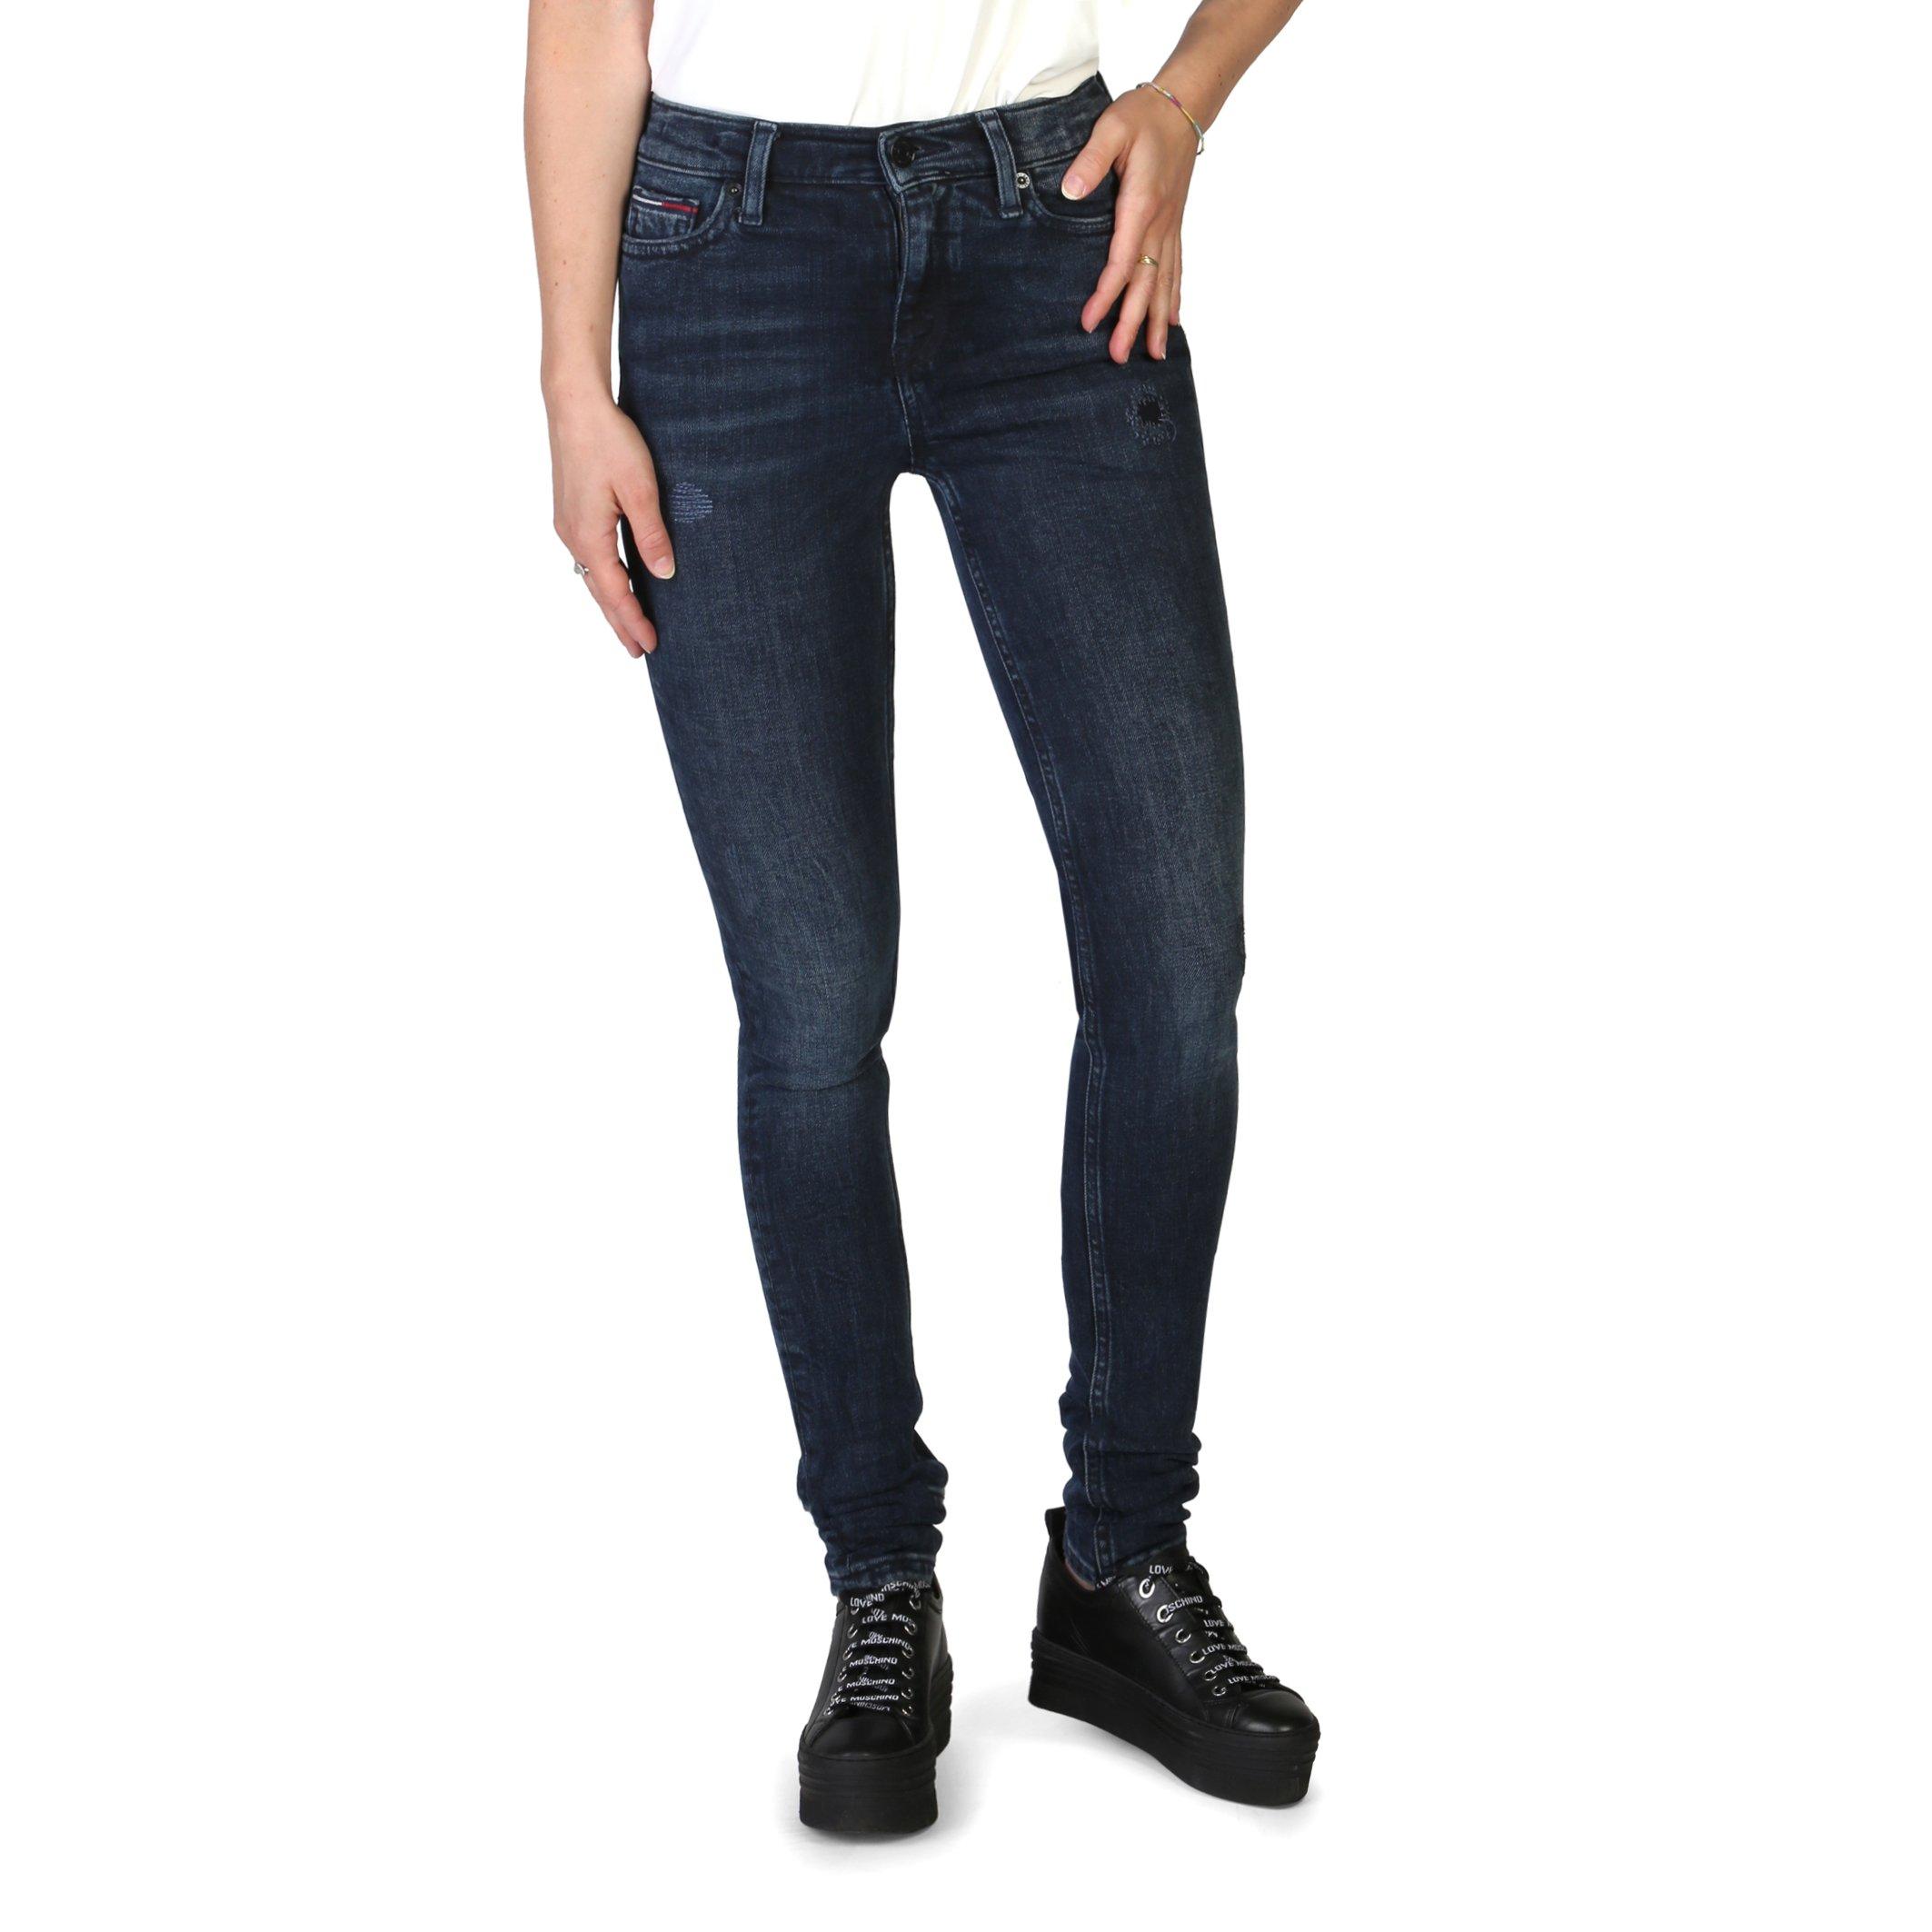 Tommy Hilfiger Women's Jeans Blue DW0DW07310 - blue-1 24